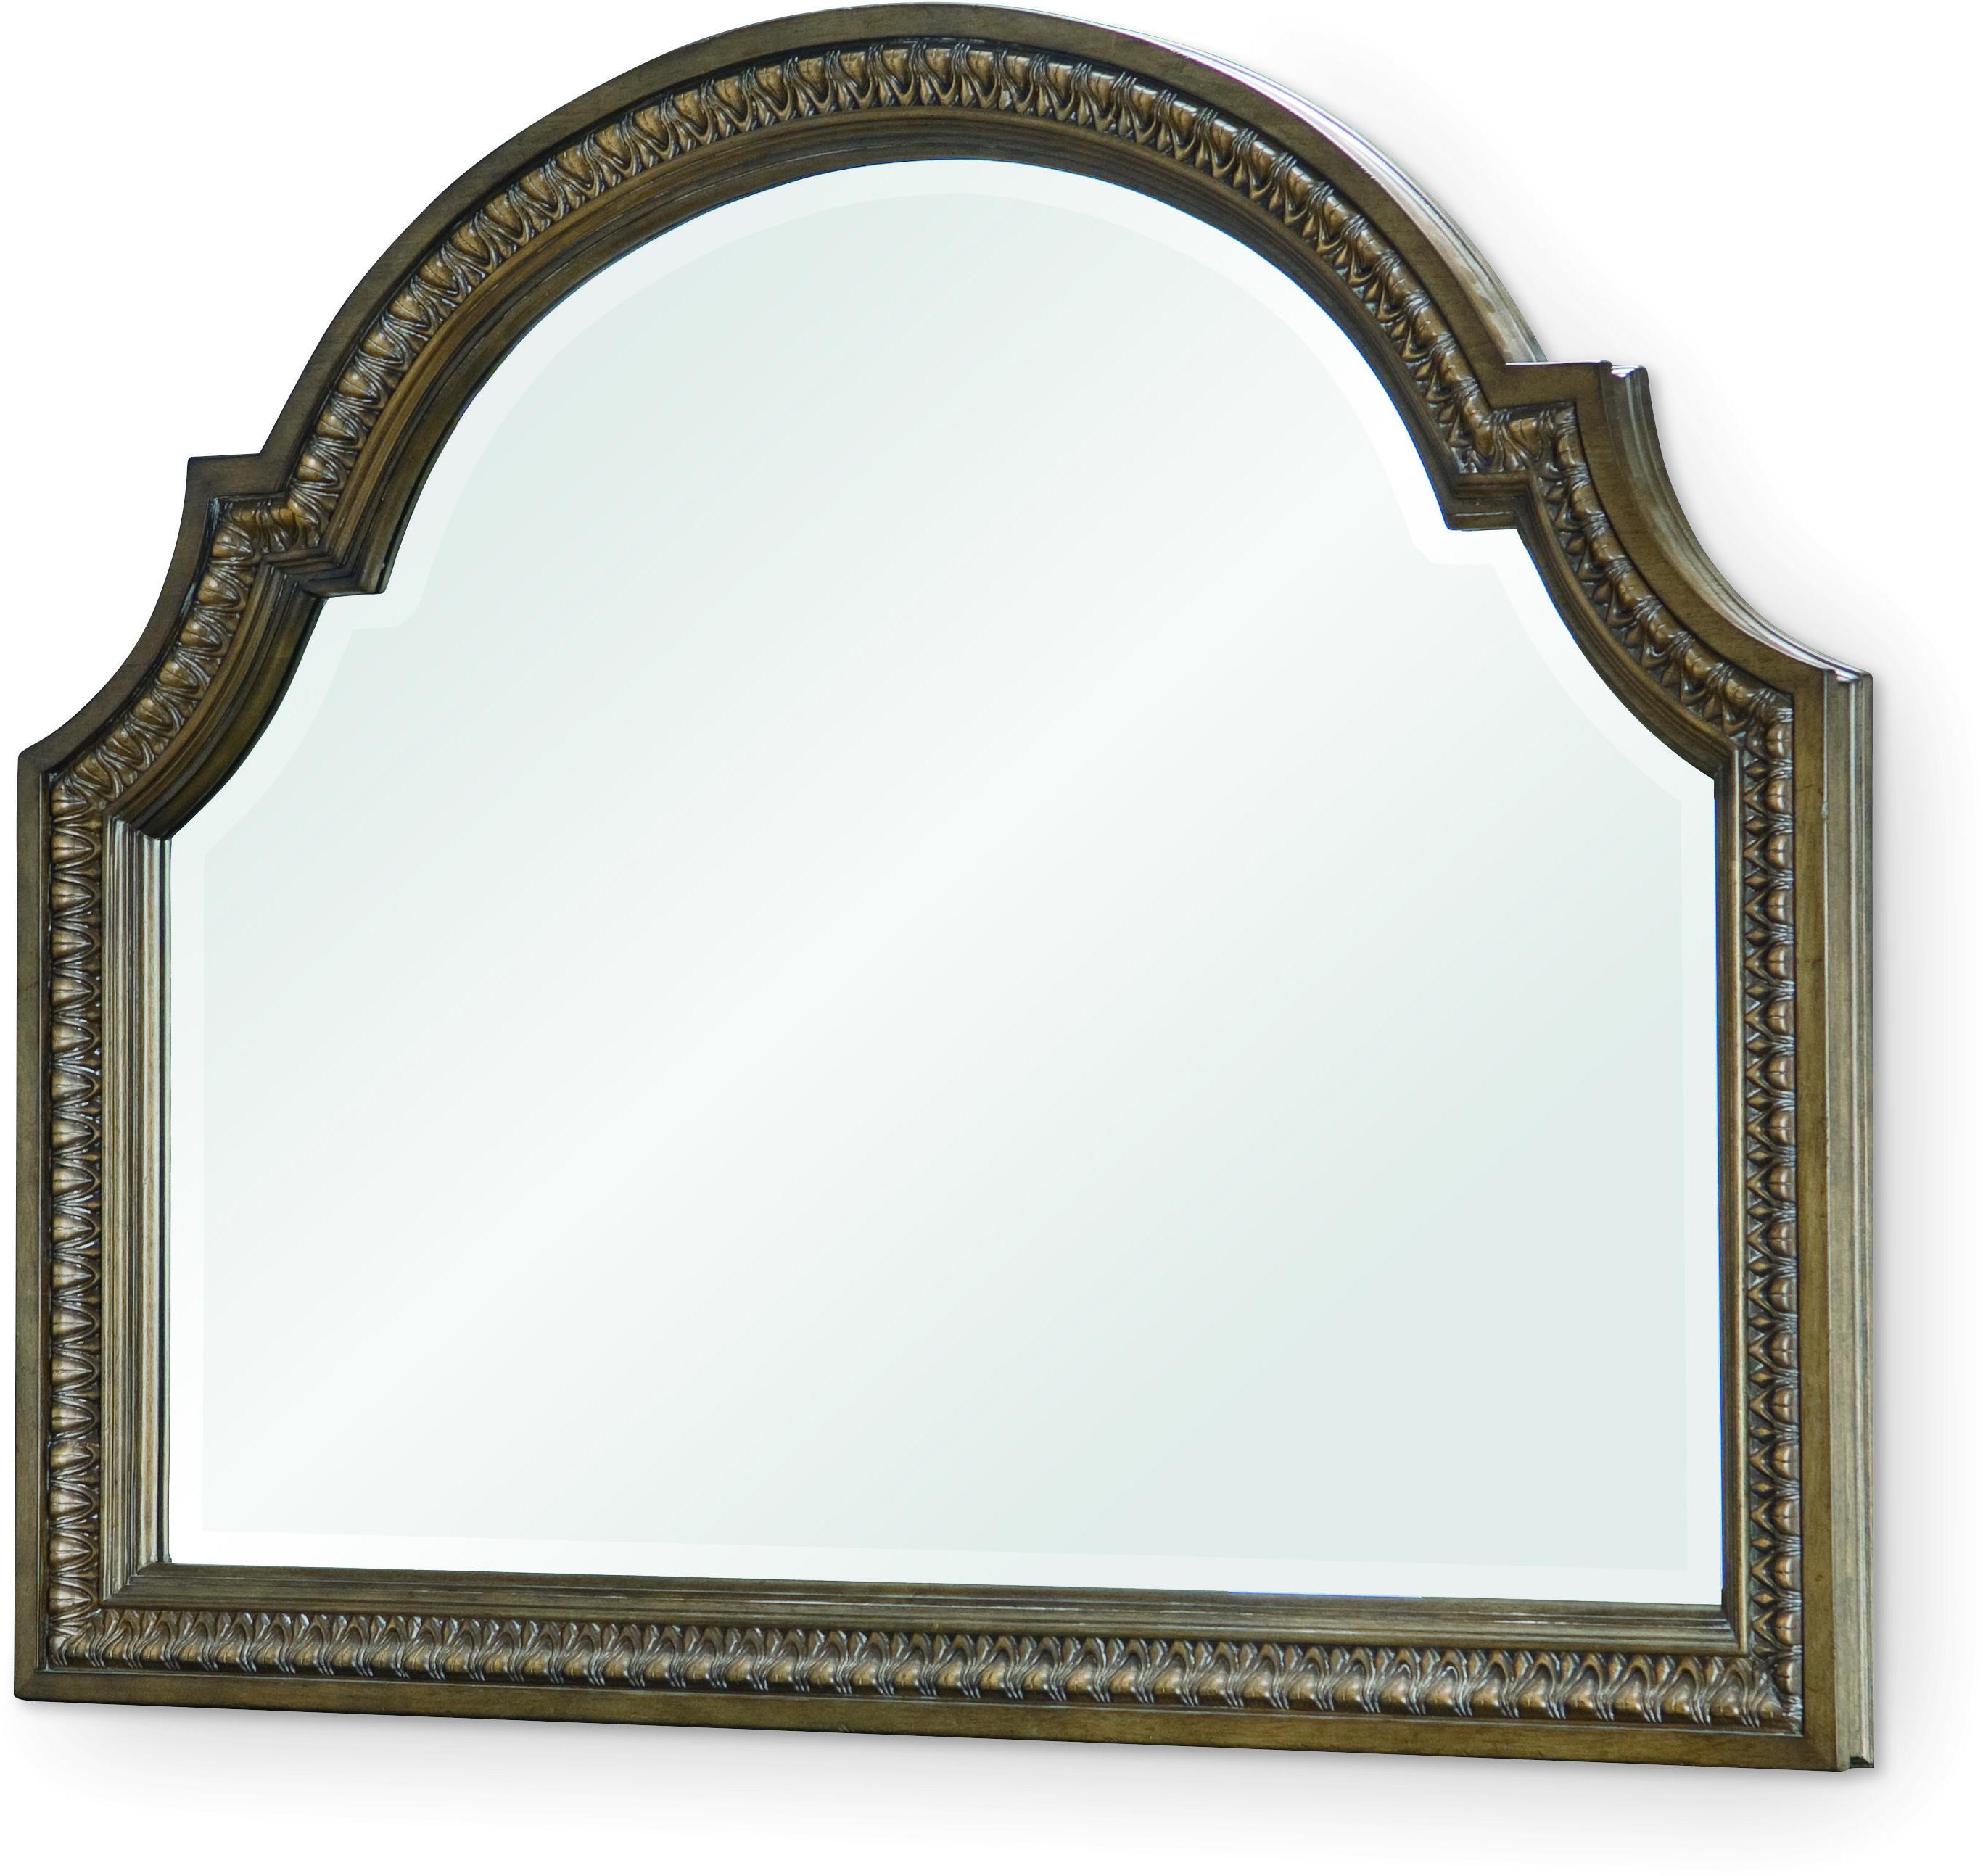 Legacy Classic Renaissance Arched Dresser Mirror  - Item Number: 5500-0200